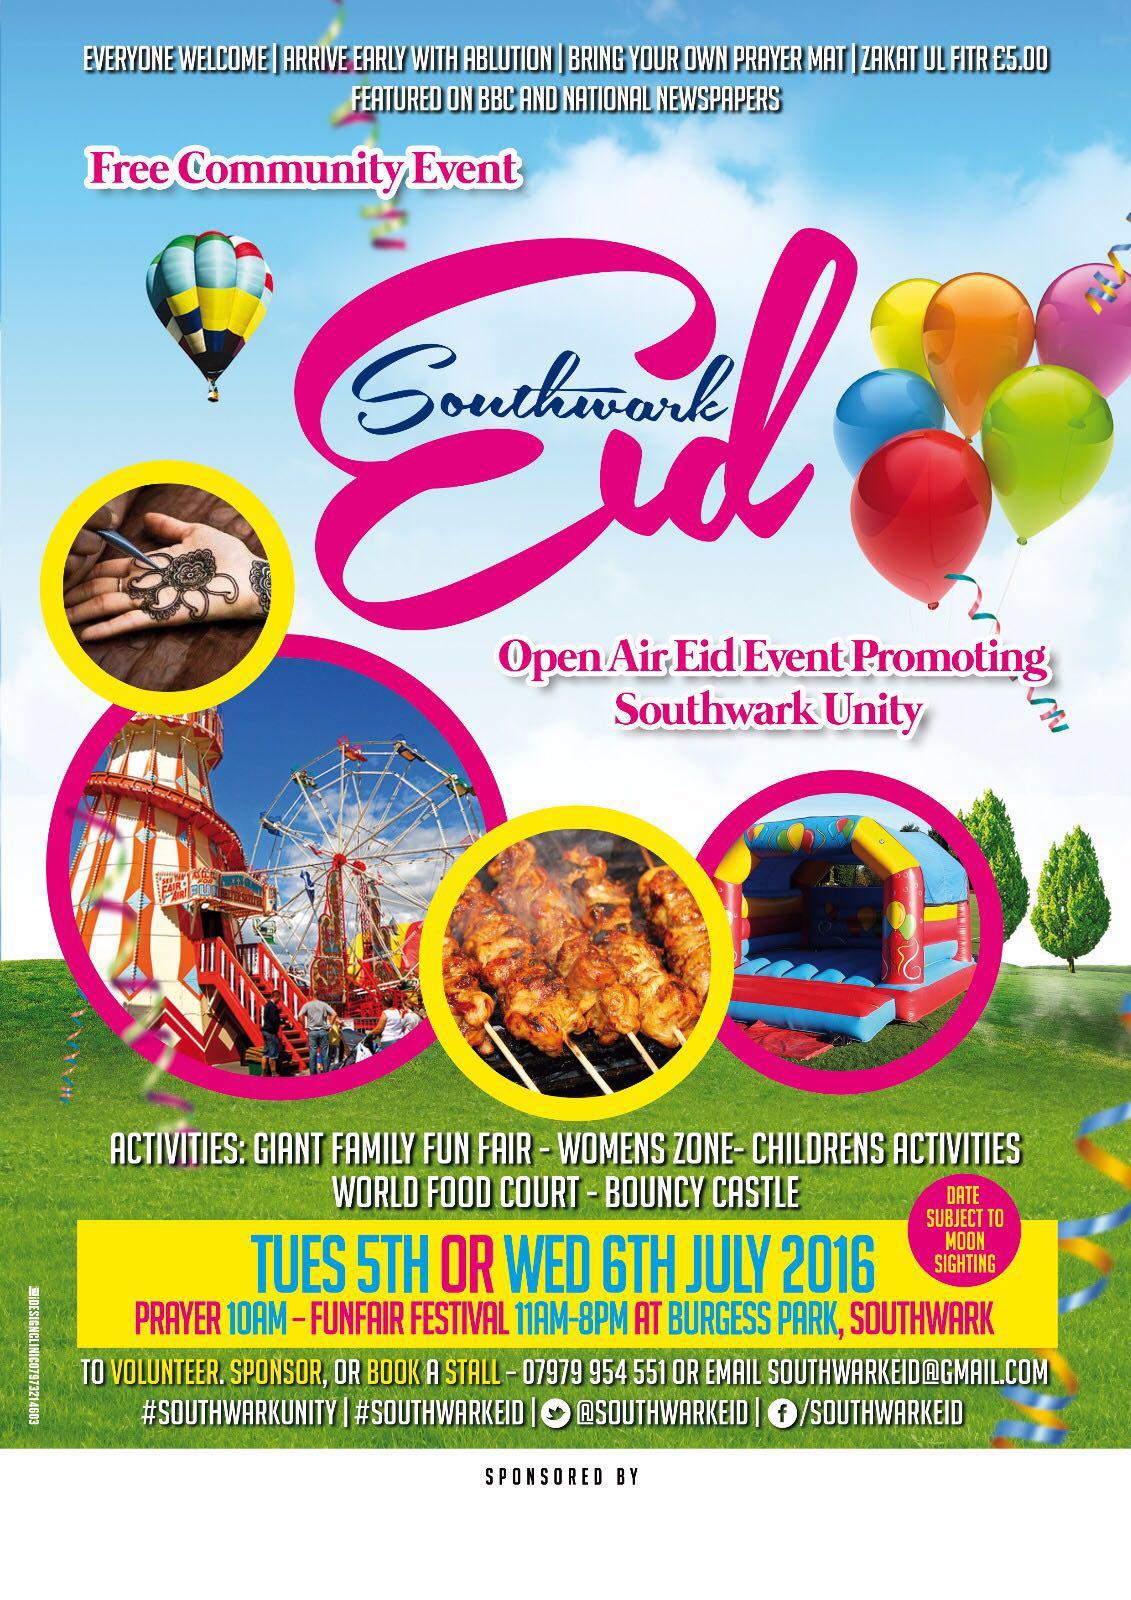 Eid mubarak festival poster template vector 02 free download |Eid Festival Poster